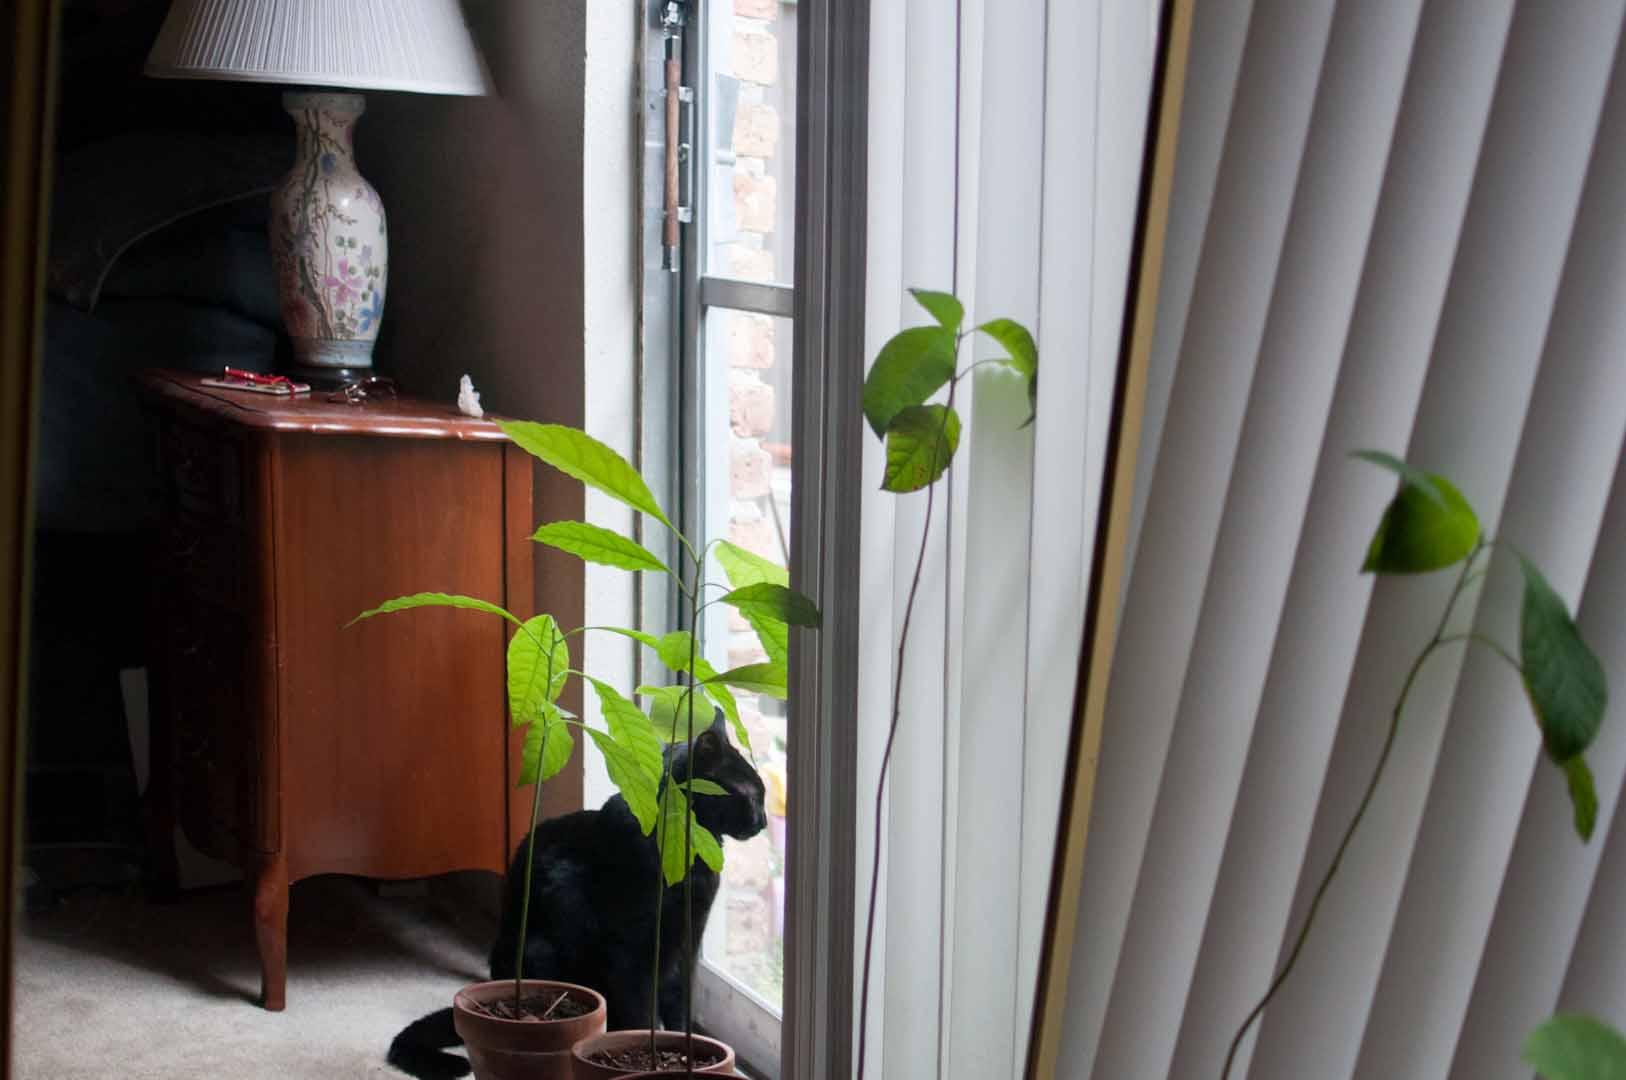 how to make an avocado seed grow